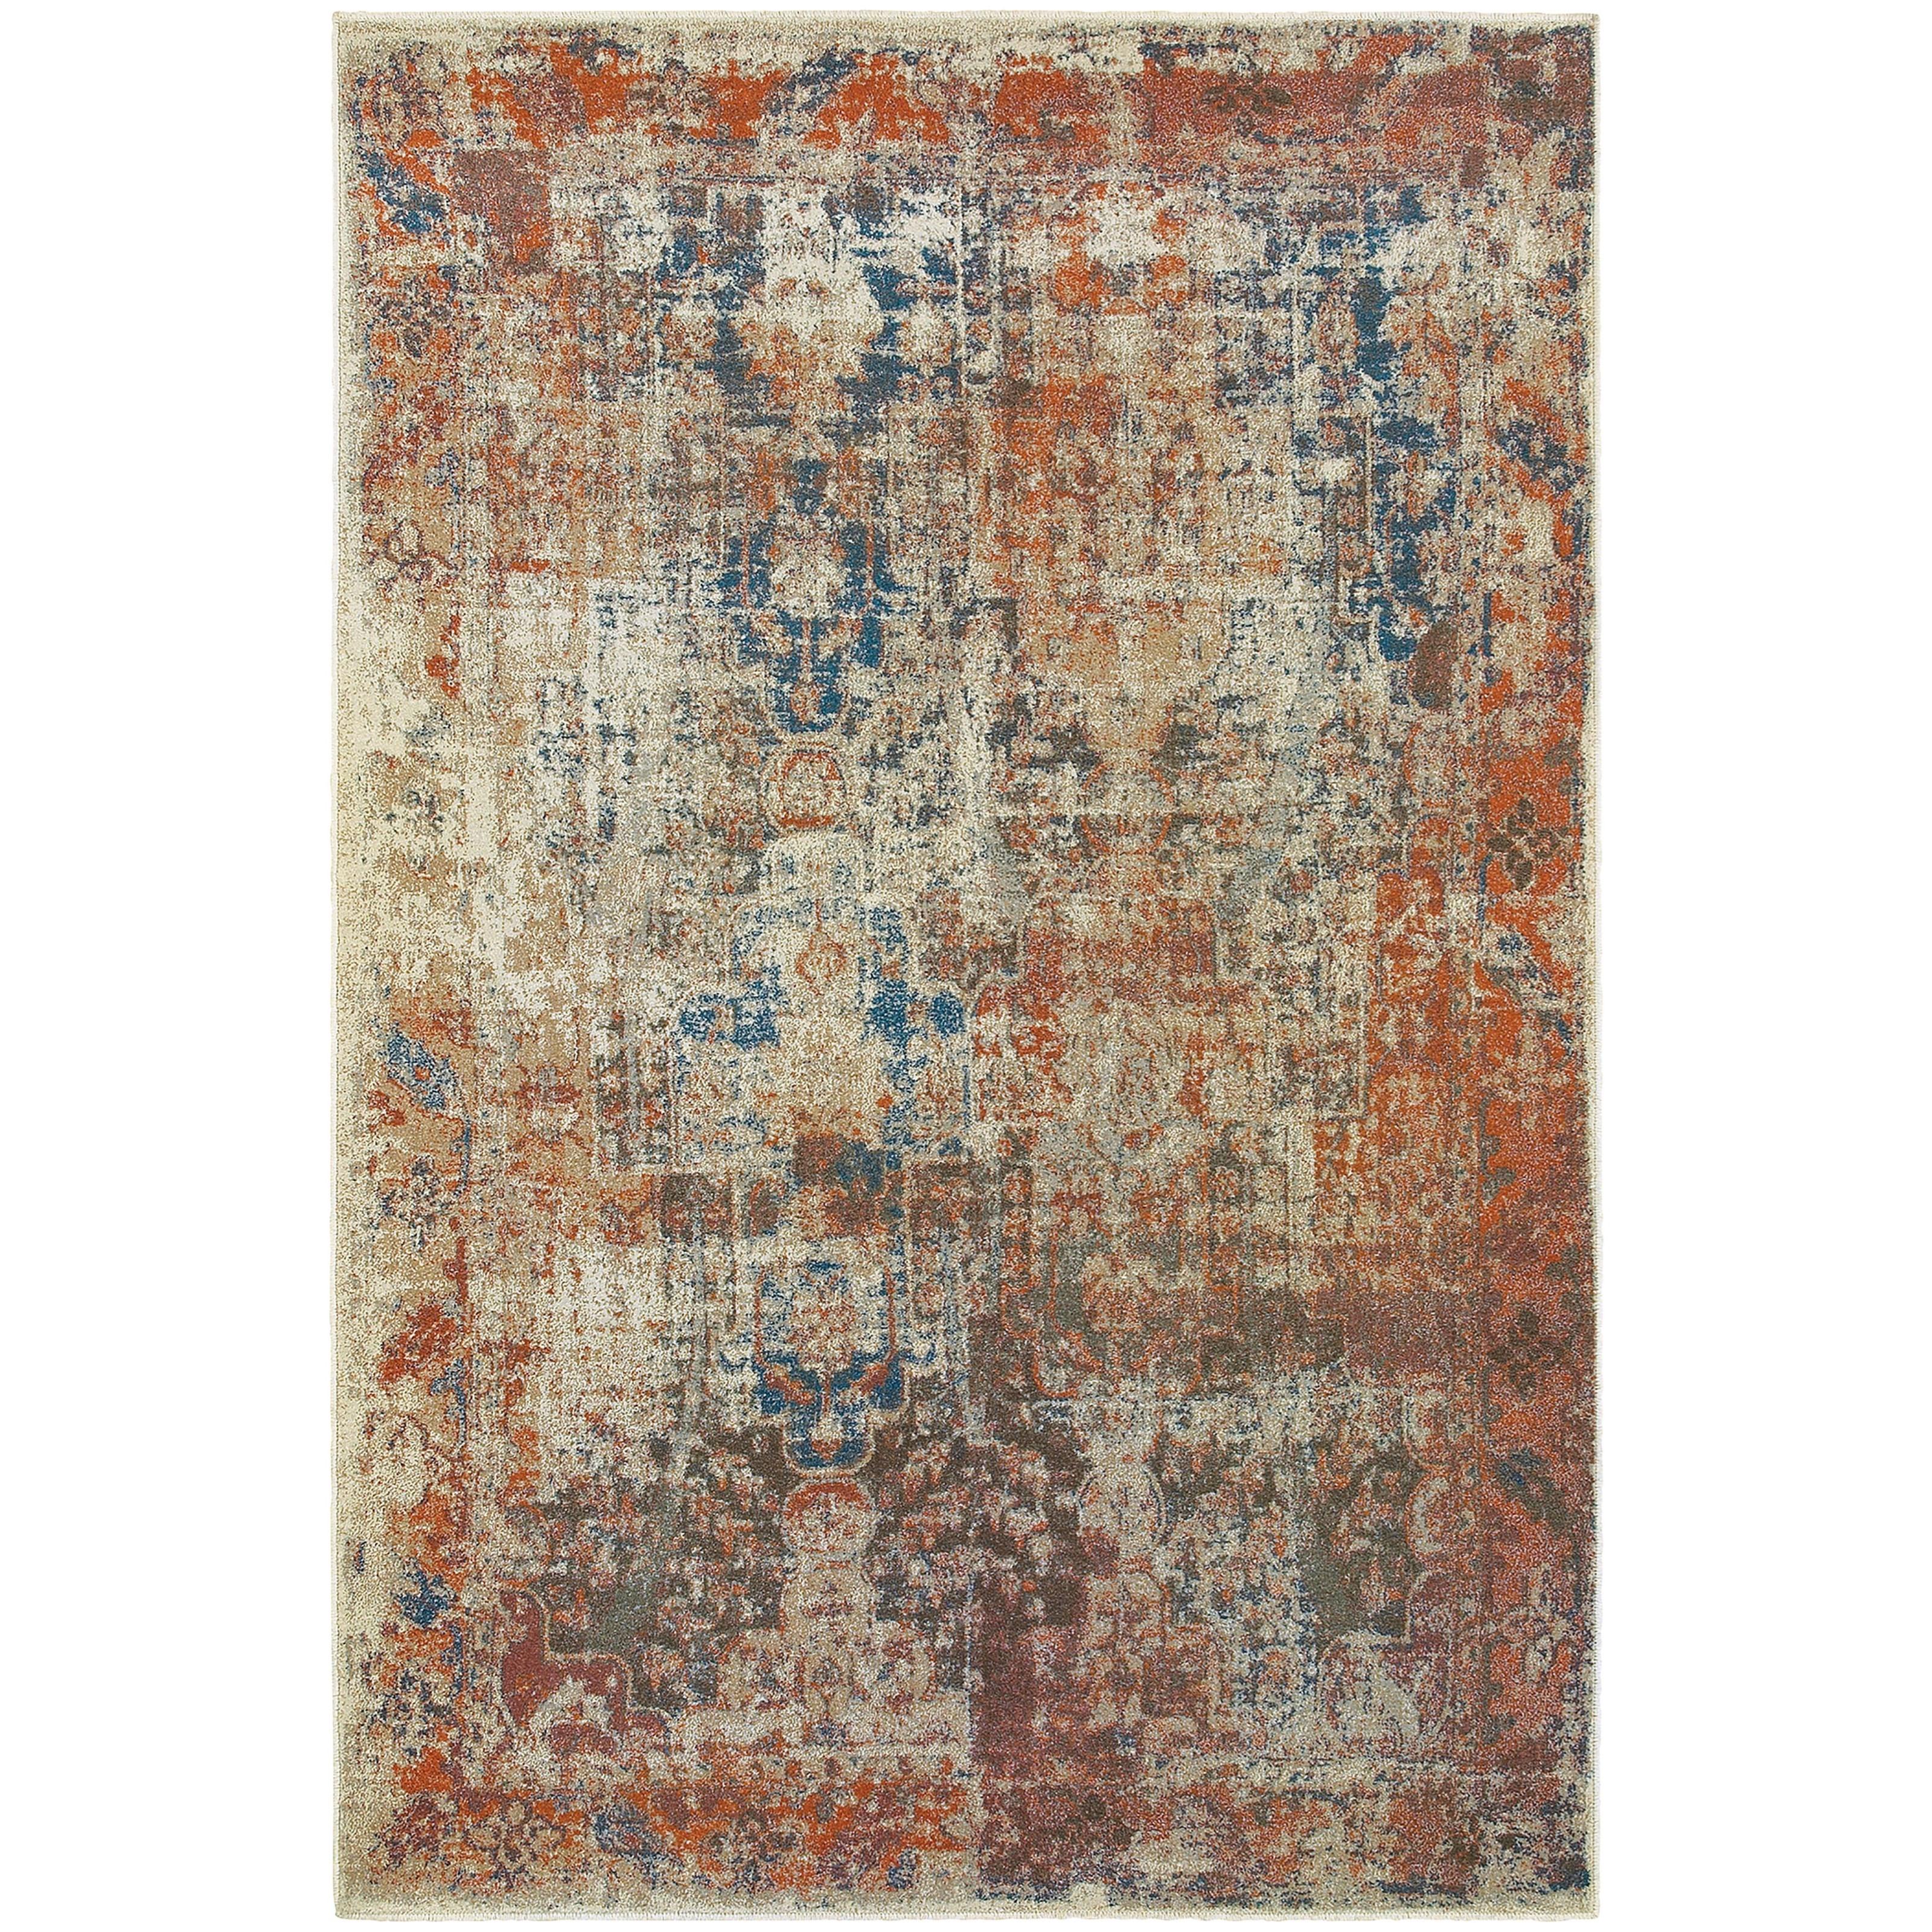 "Pasha 7'10"" X 10'10"" Rug by Oriental Weavers at HomeWorld Furniture"